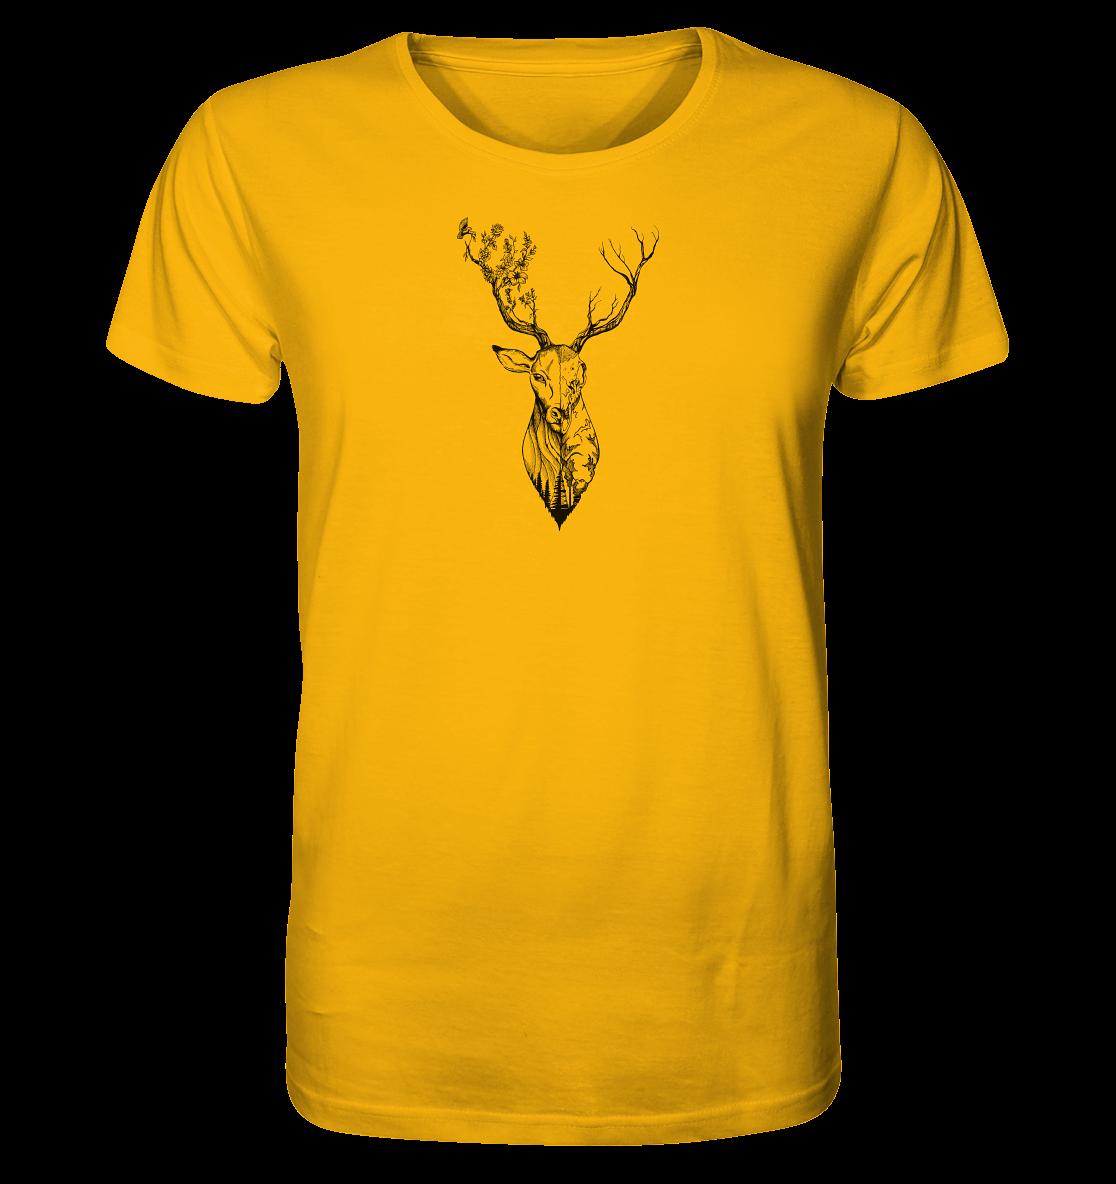 front-organic-shirt-fab40d-1116x-8.png